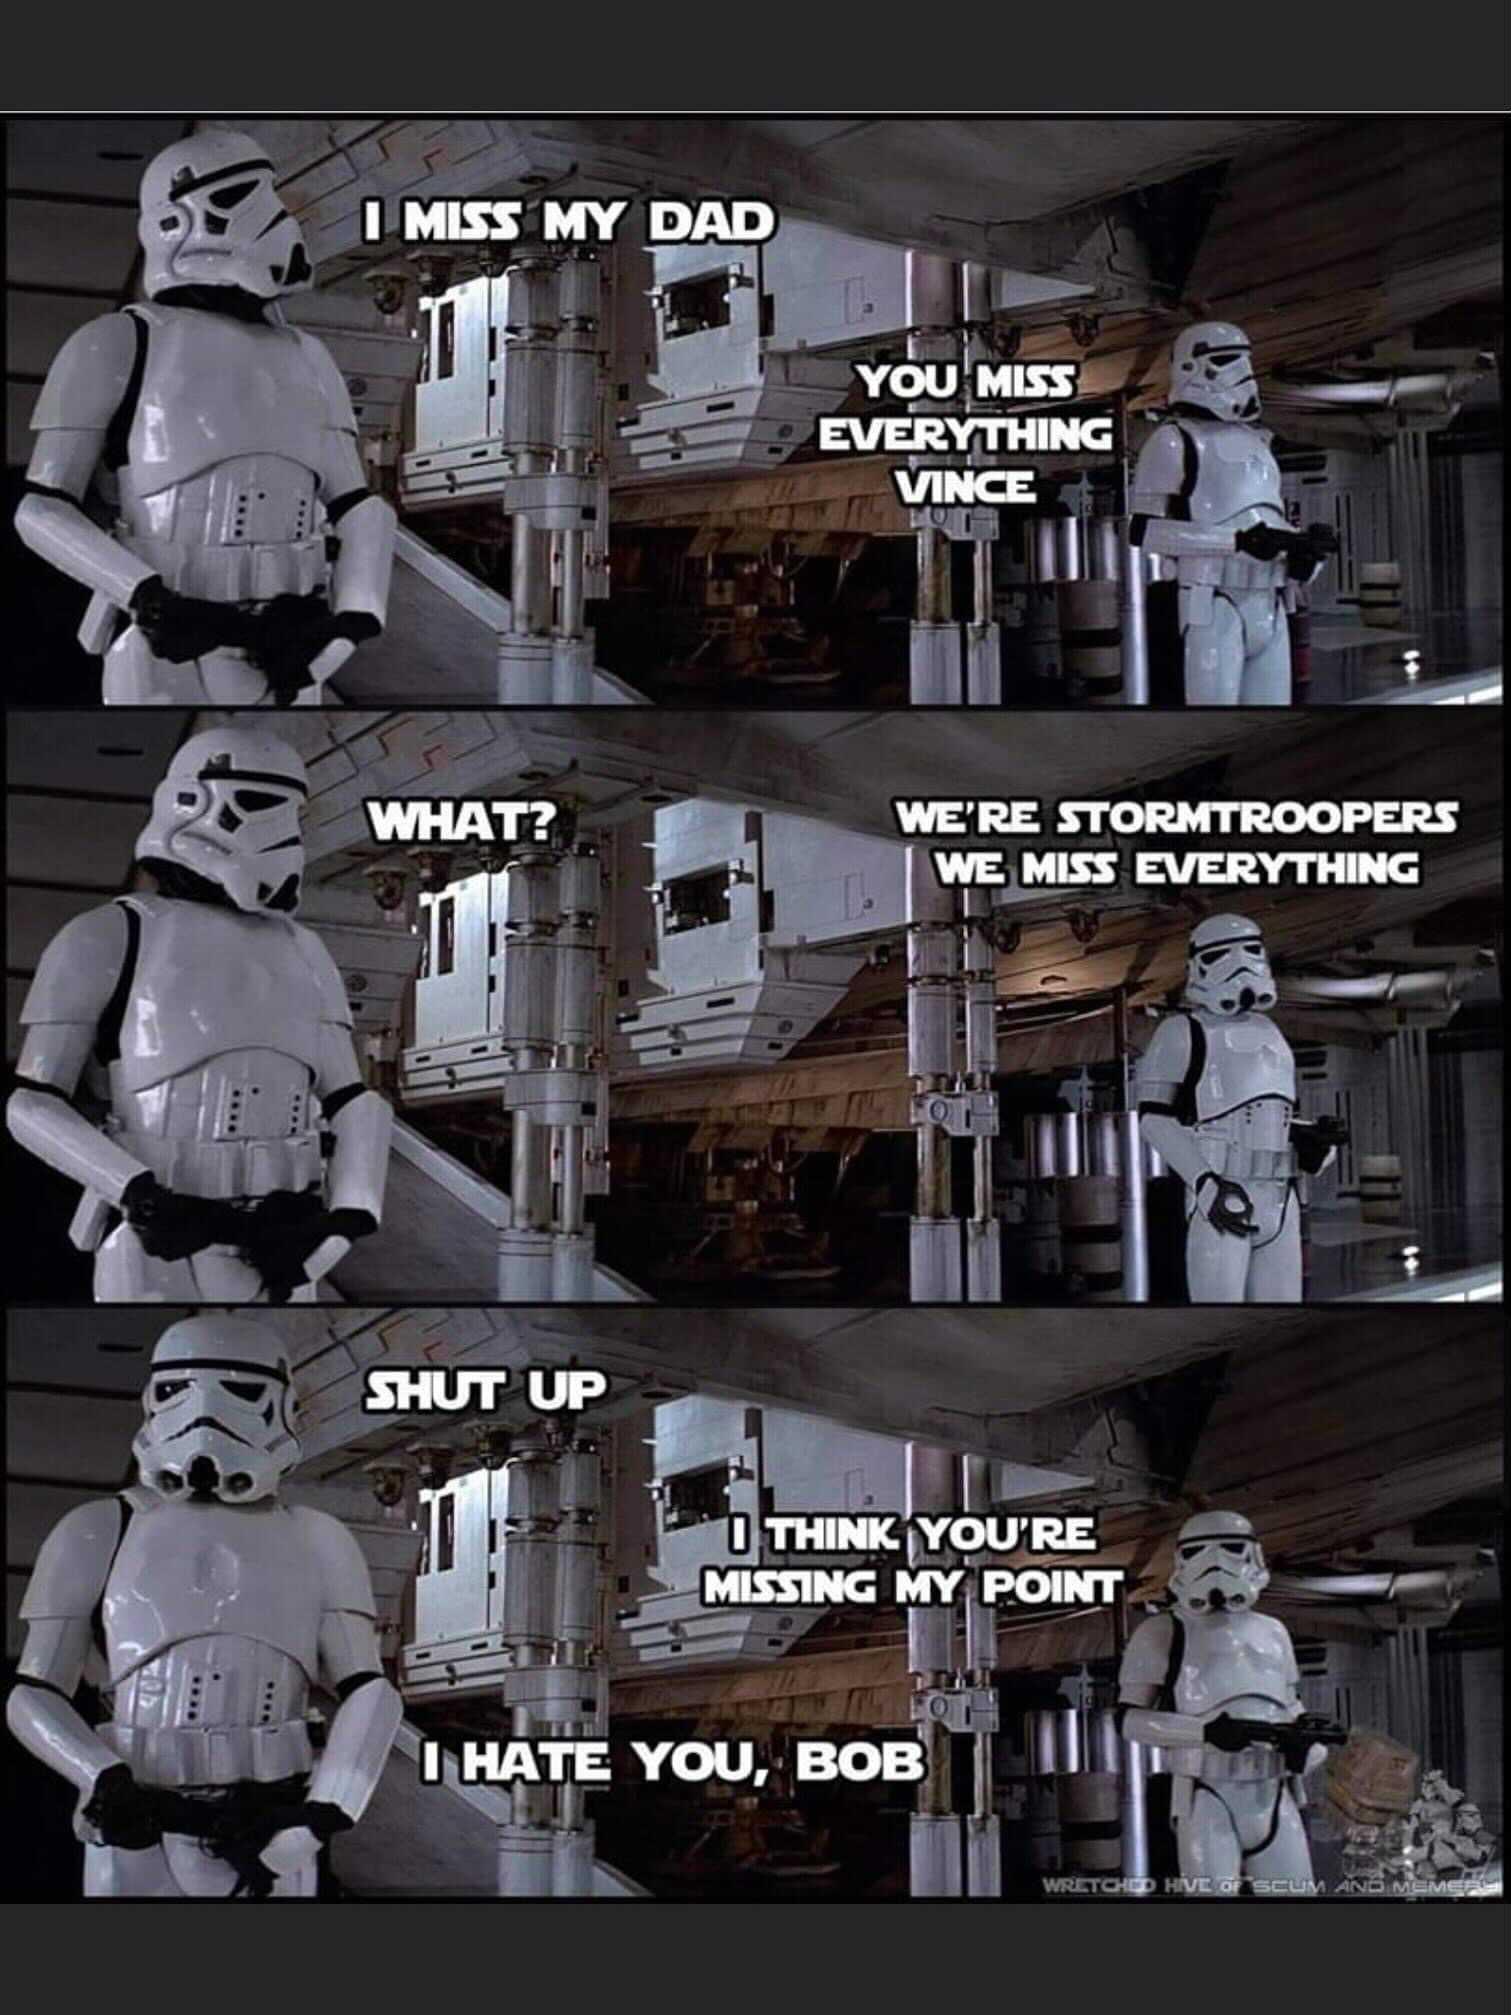 Stormtrooper miss the point .jpg